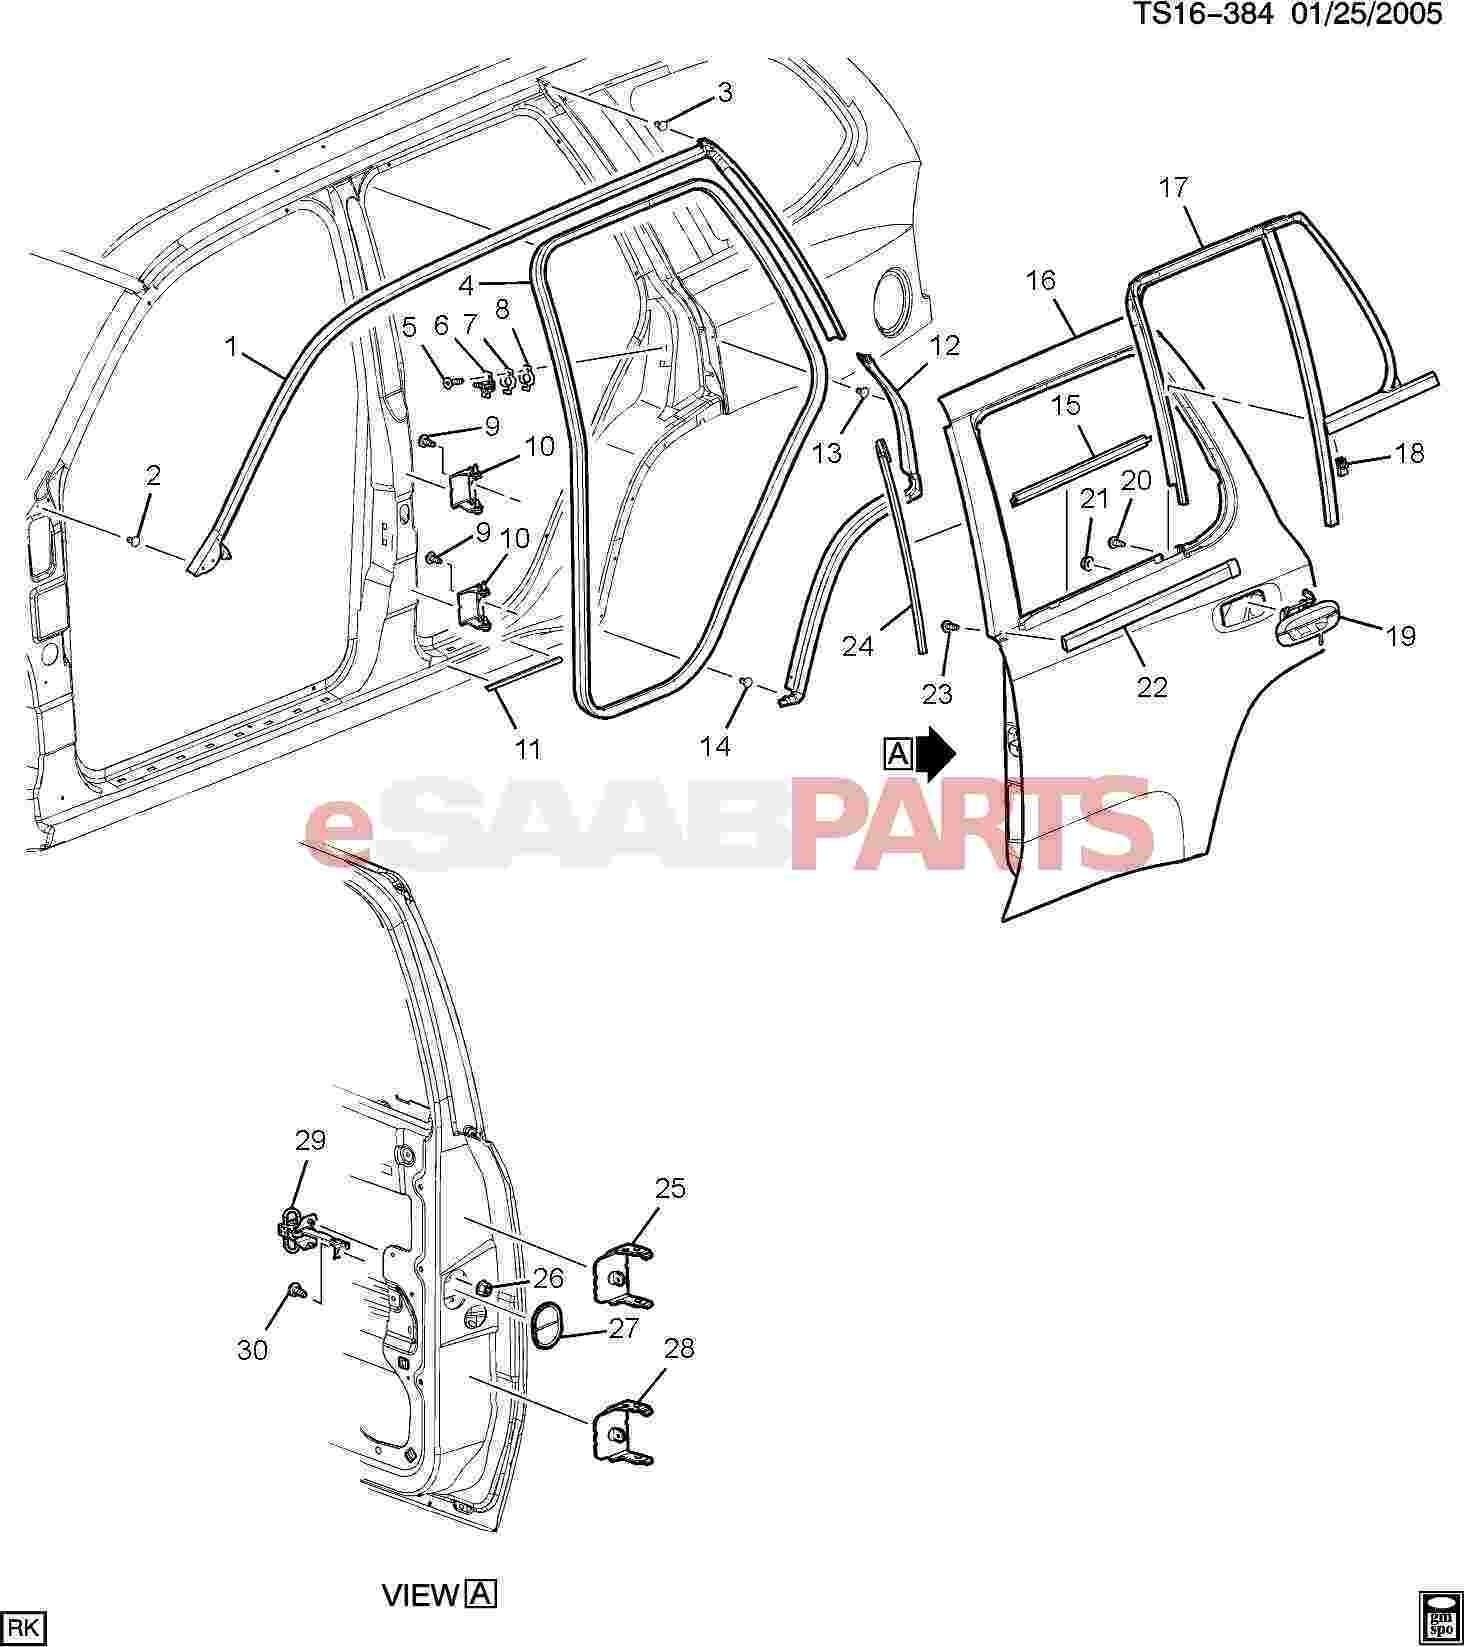 Car Parts Diagram Suspension Diagram Parts Under A Car Basic Diagram Car Parts ] Saab Screw Of Car Parts Diagram Suspension